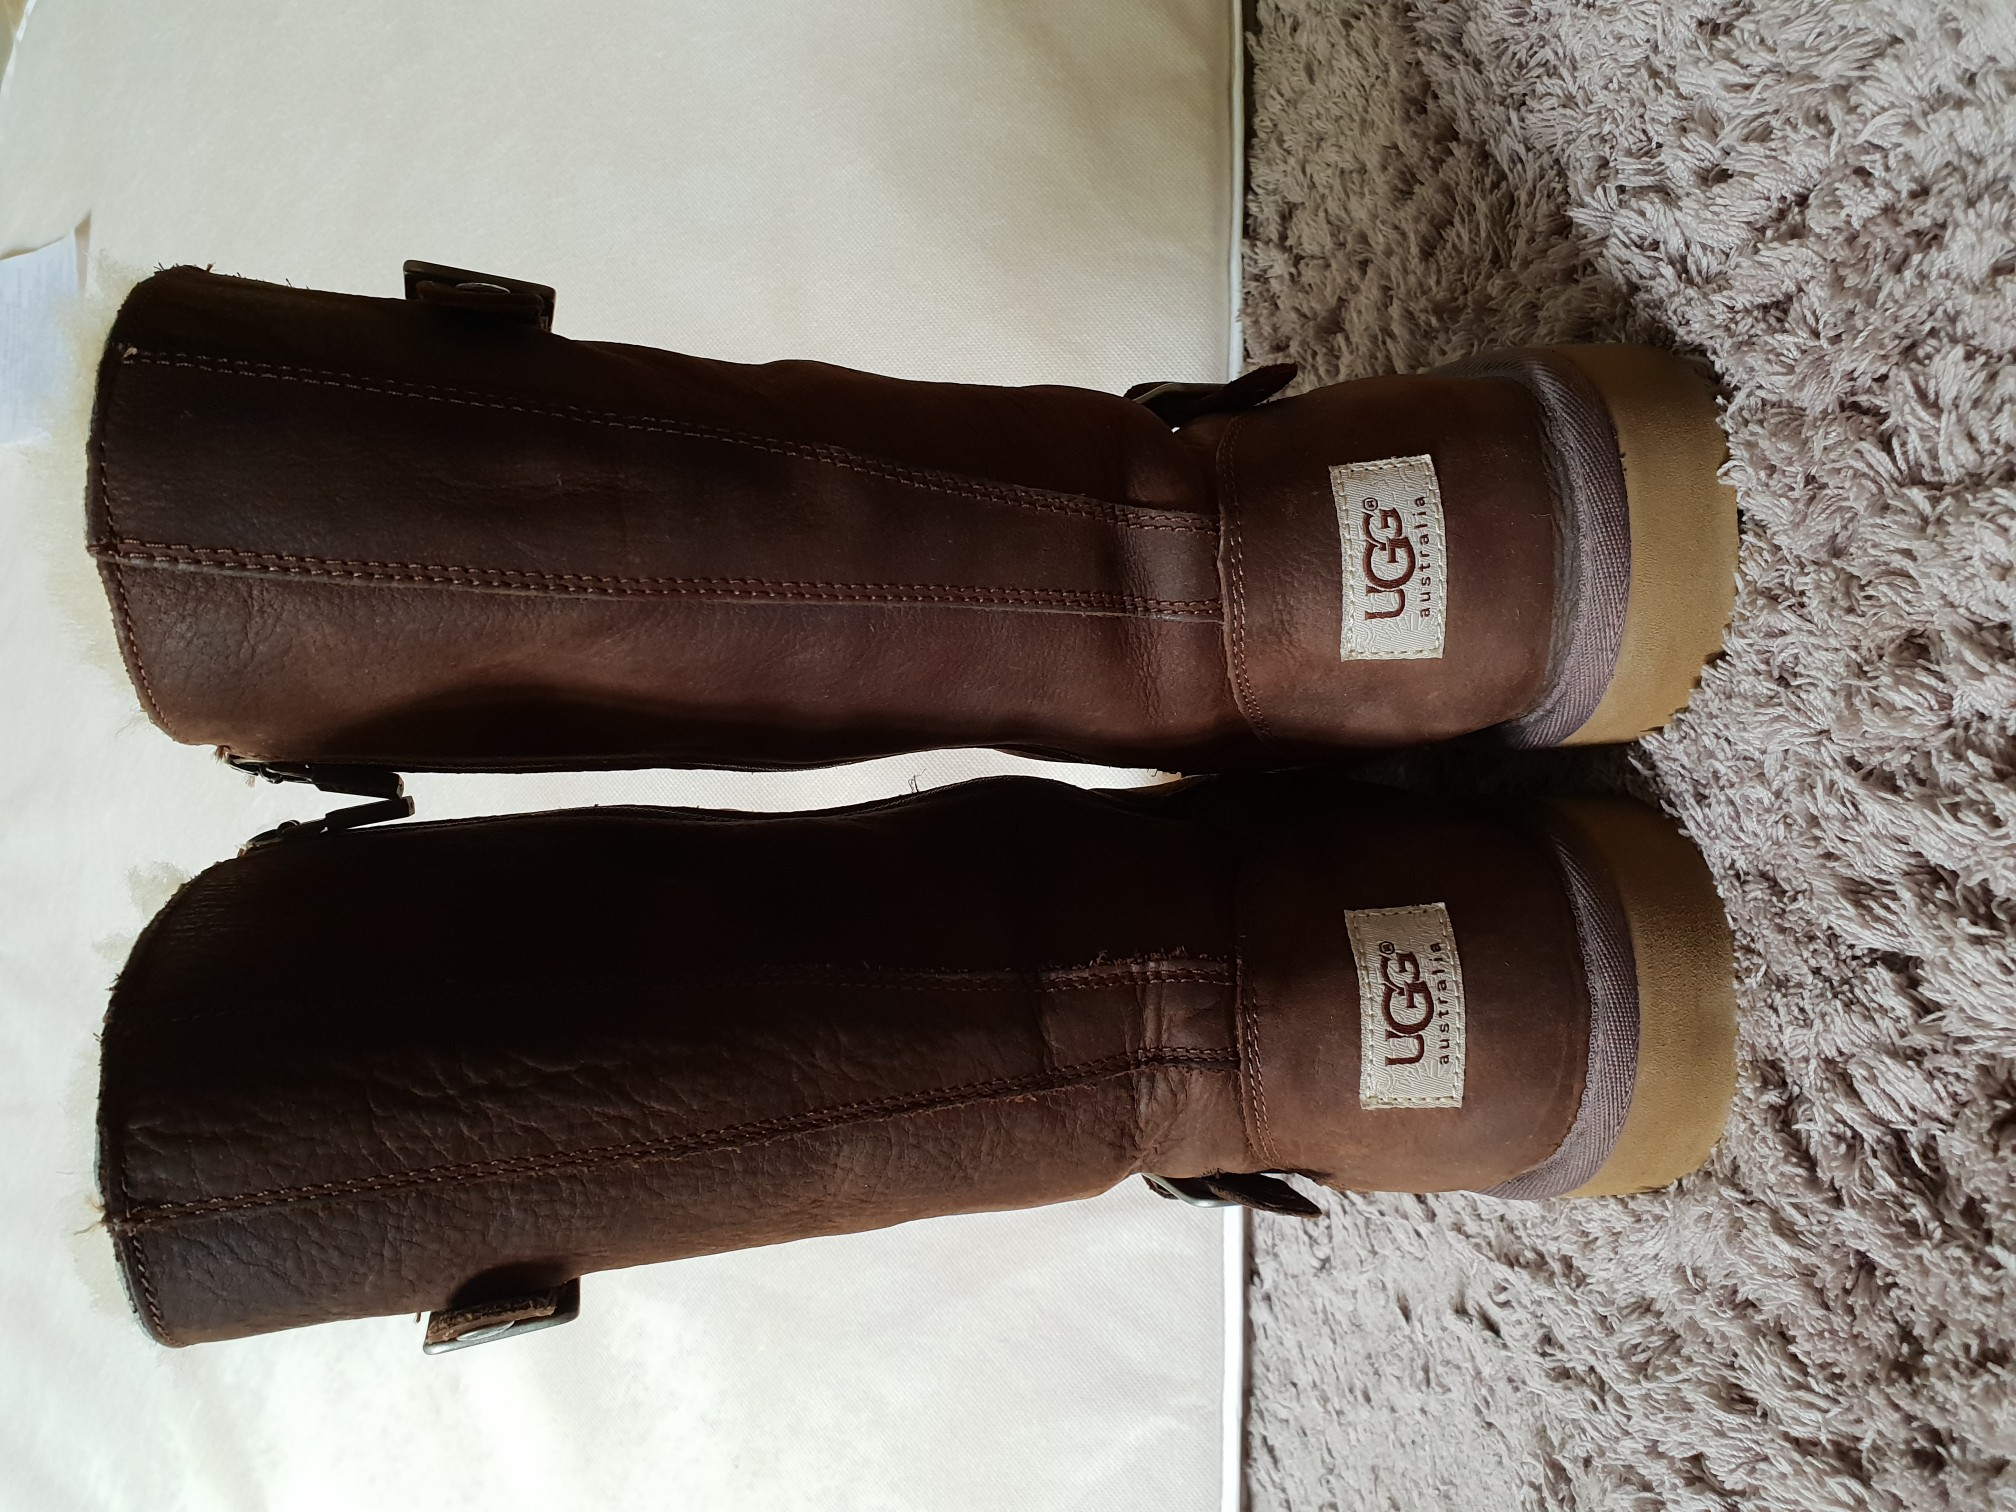 bottes UGG Vêtements bottes Second Hand , Chaussures et et UGG bijoux | a844d98 - christopherbooneavalere.website